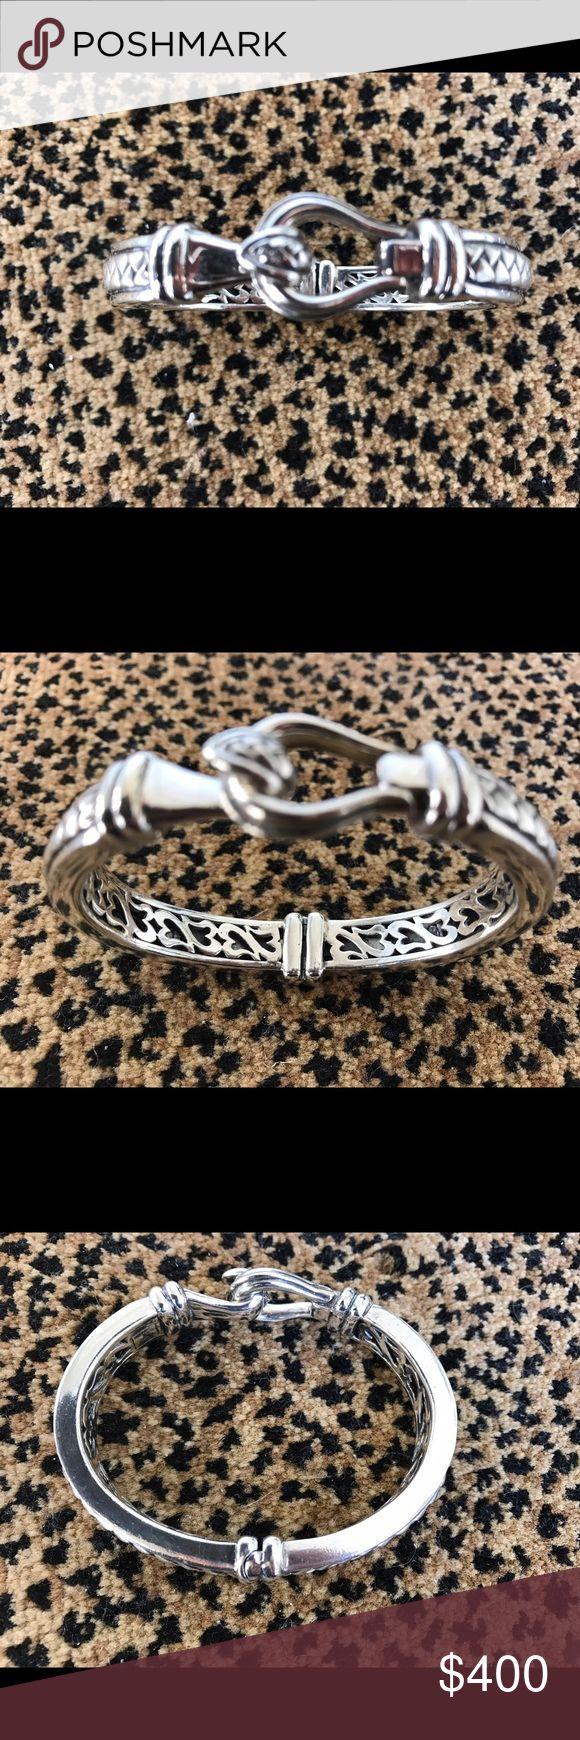 Scott Kay bracelet Scott Kay sterling silver equestrian buckle basketweave bracelet  6.1/4excellent condition scott kay Jewelry Bracelets